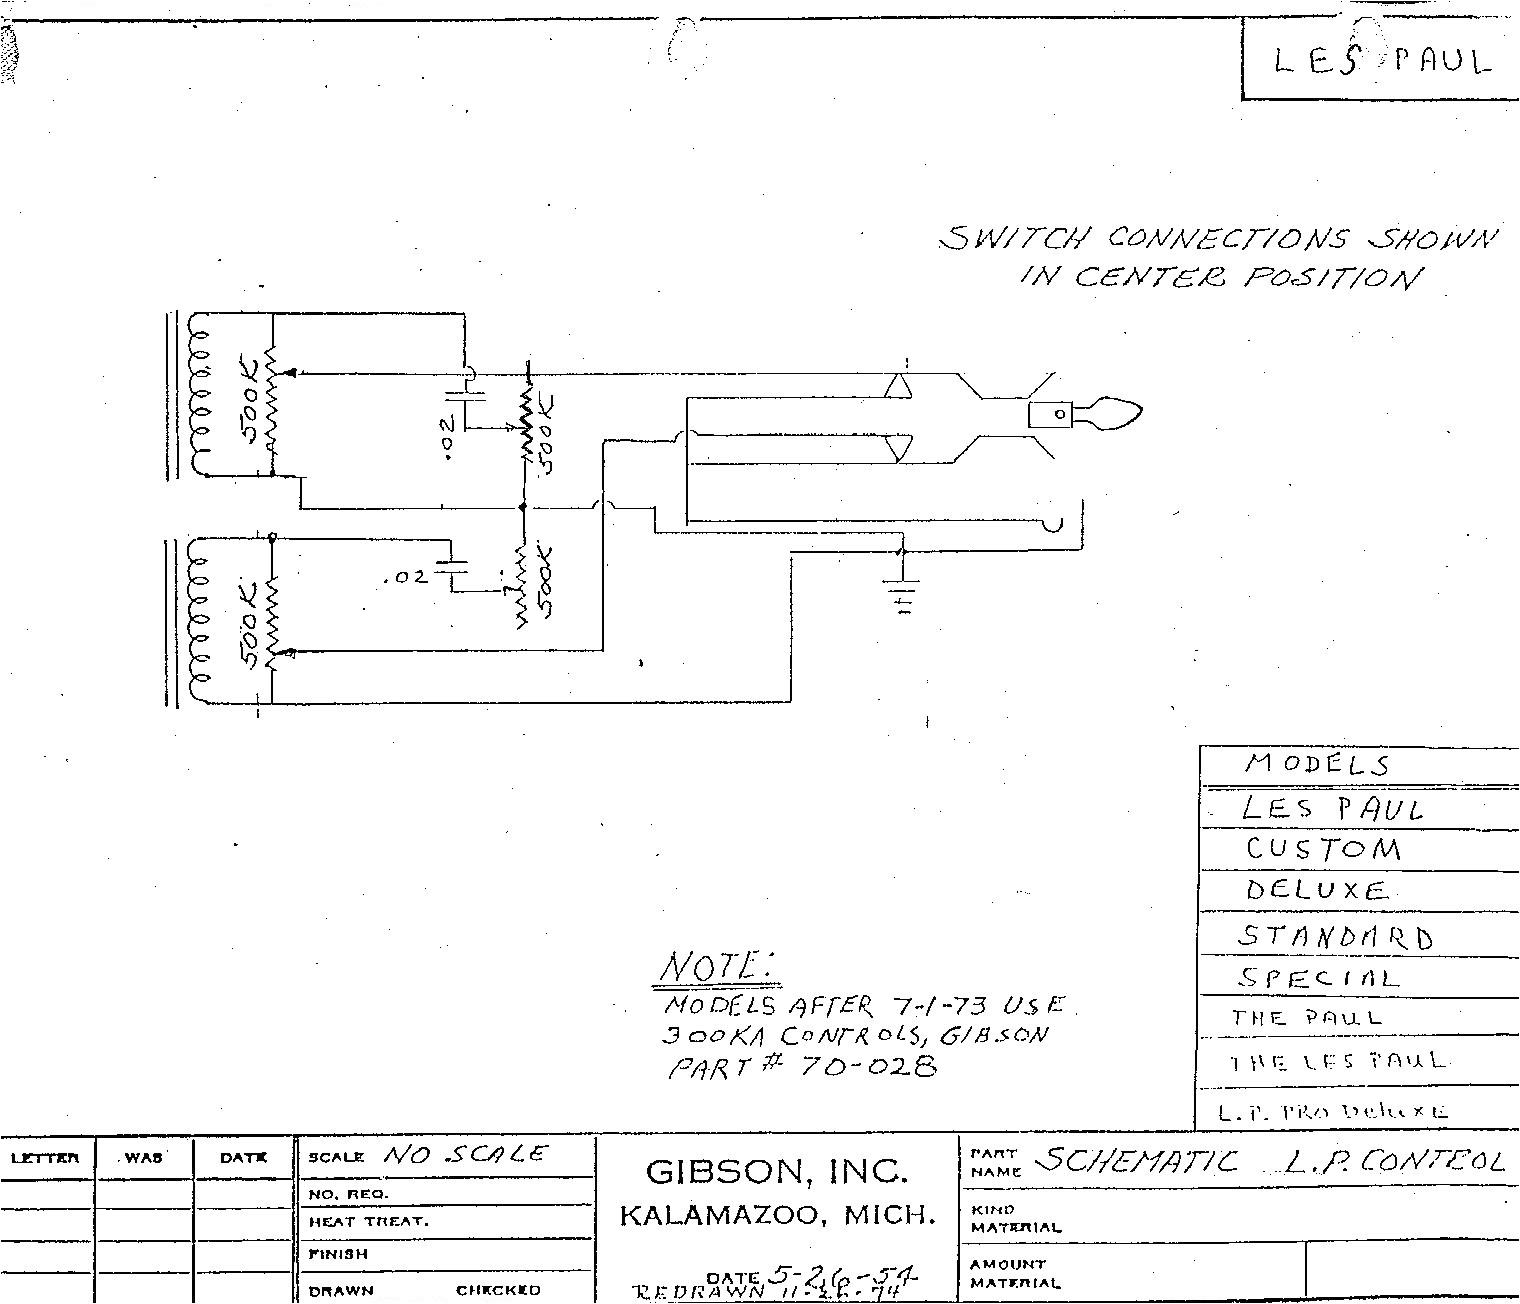 gibson varitone wiring diagram inspirational 335 gibson pickups wiring diagrams enthusiast wiring diagrams